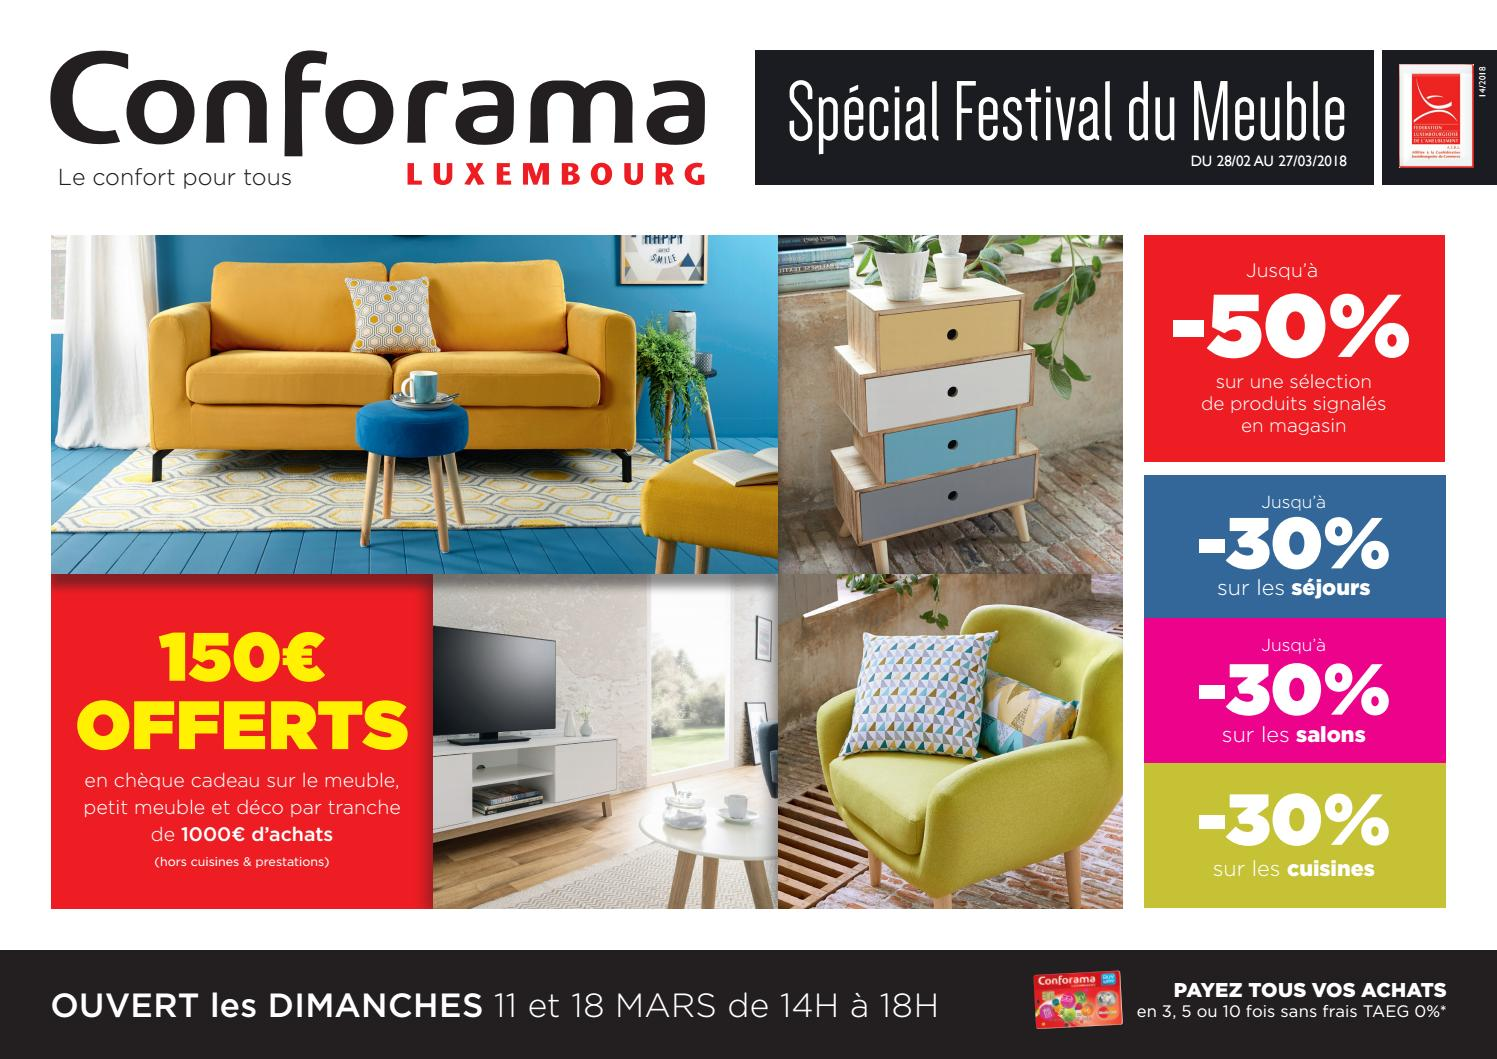 By Luxembourg Conforama Doc Festival Meuble Du Issuu 14Spécial pGLUzSVMq